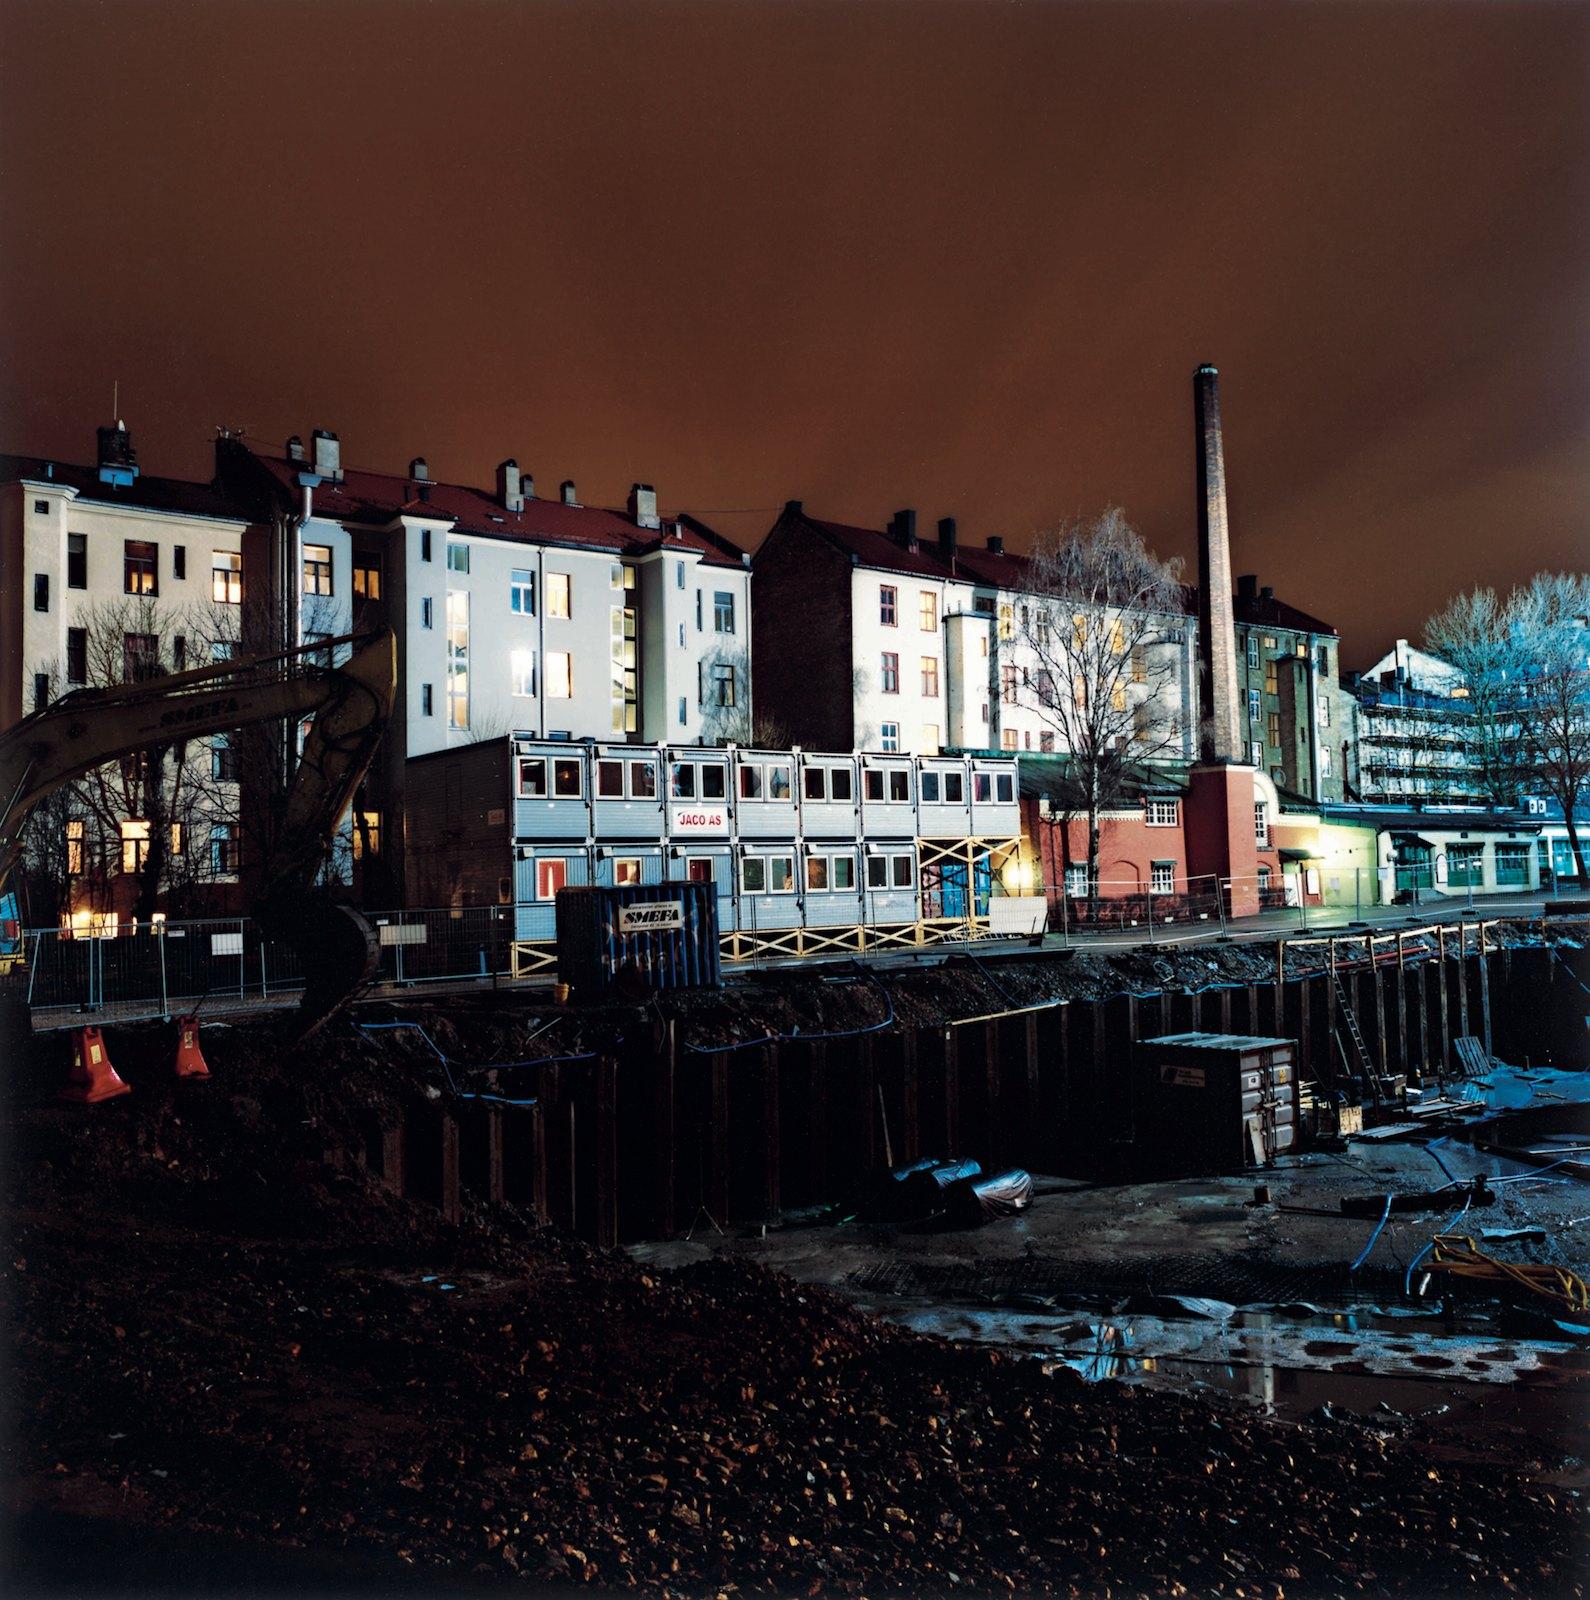 Neighbourhood 23:30, 2008, C-print, 100 x 100 cm